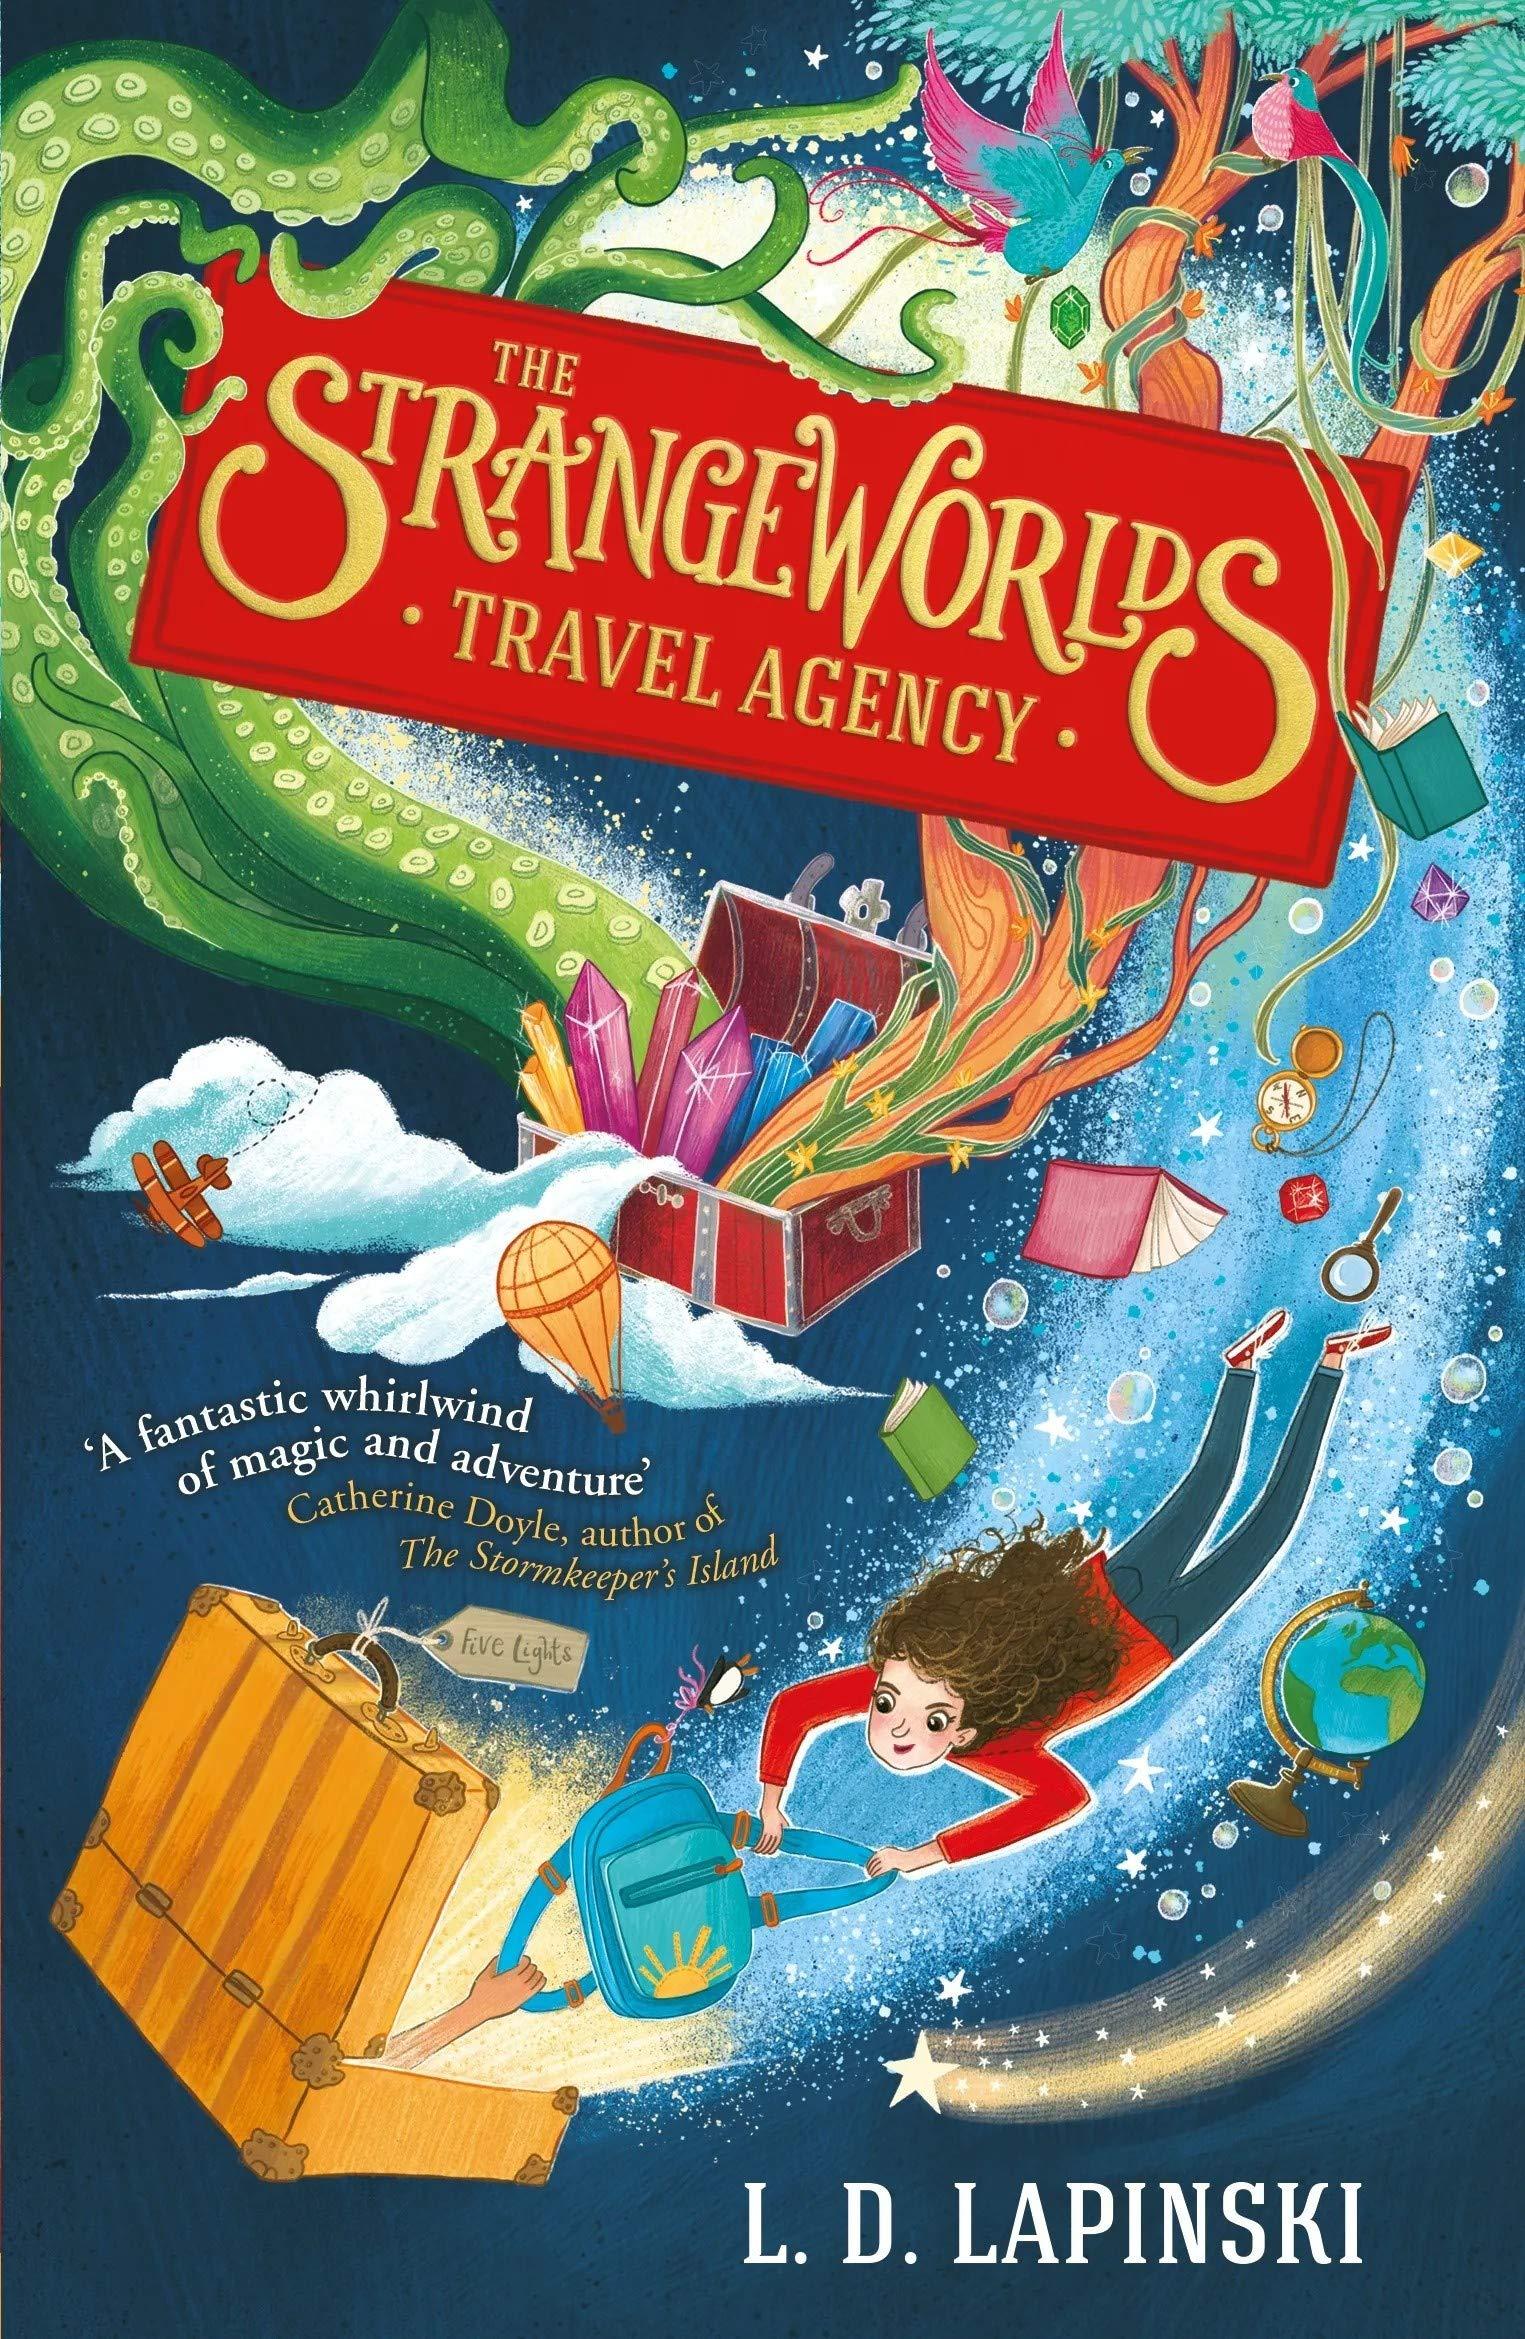 The Strangeworlds Travel Agency Idioma Inglés : Book 1: Amazon.es: Lapinski, L.D.: Libros en idiomas extranjeros